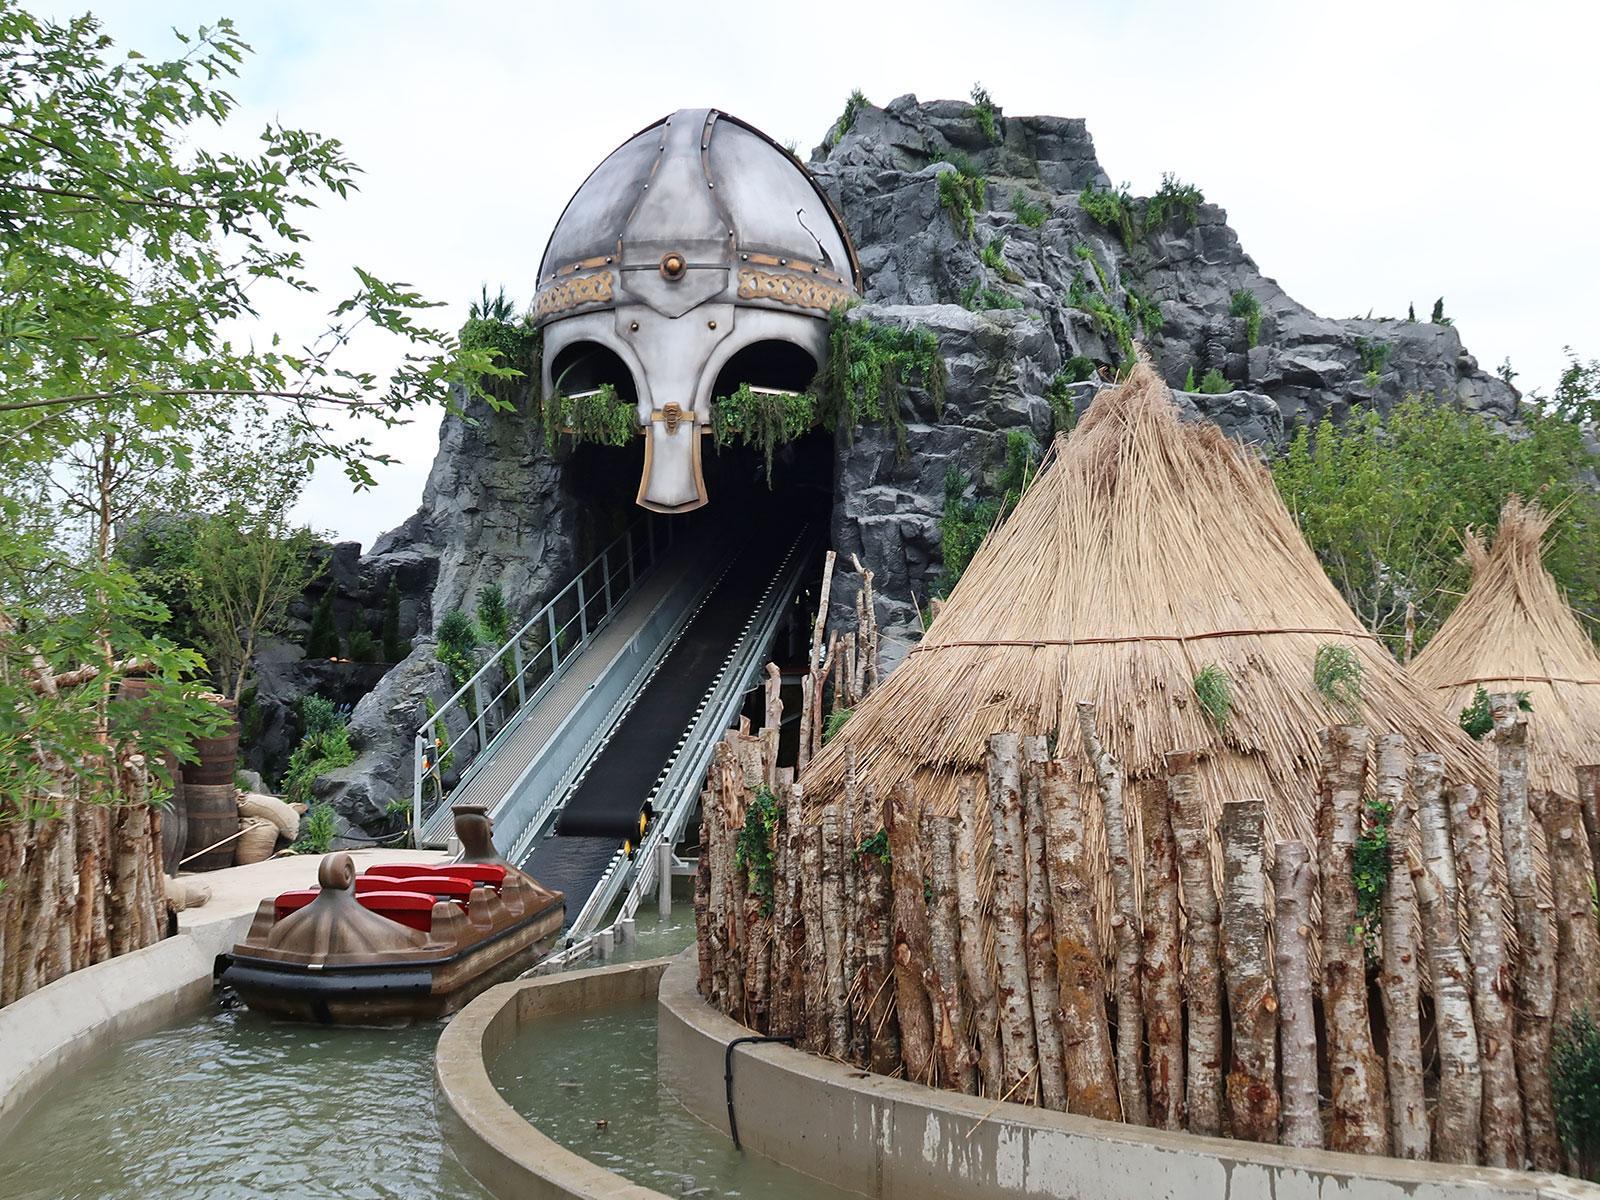 Interlink New Ride : Superflume Viking Voyage boat at Tayto Park